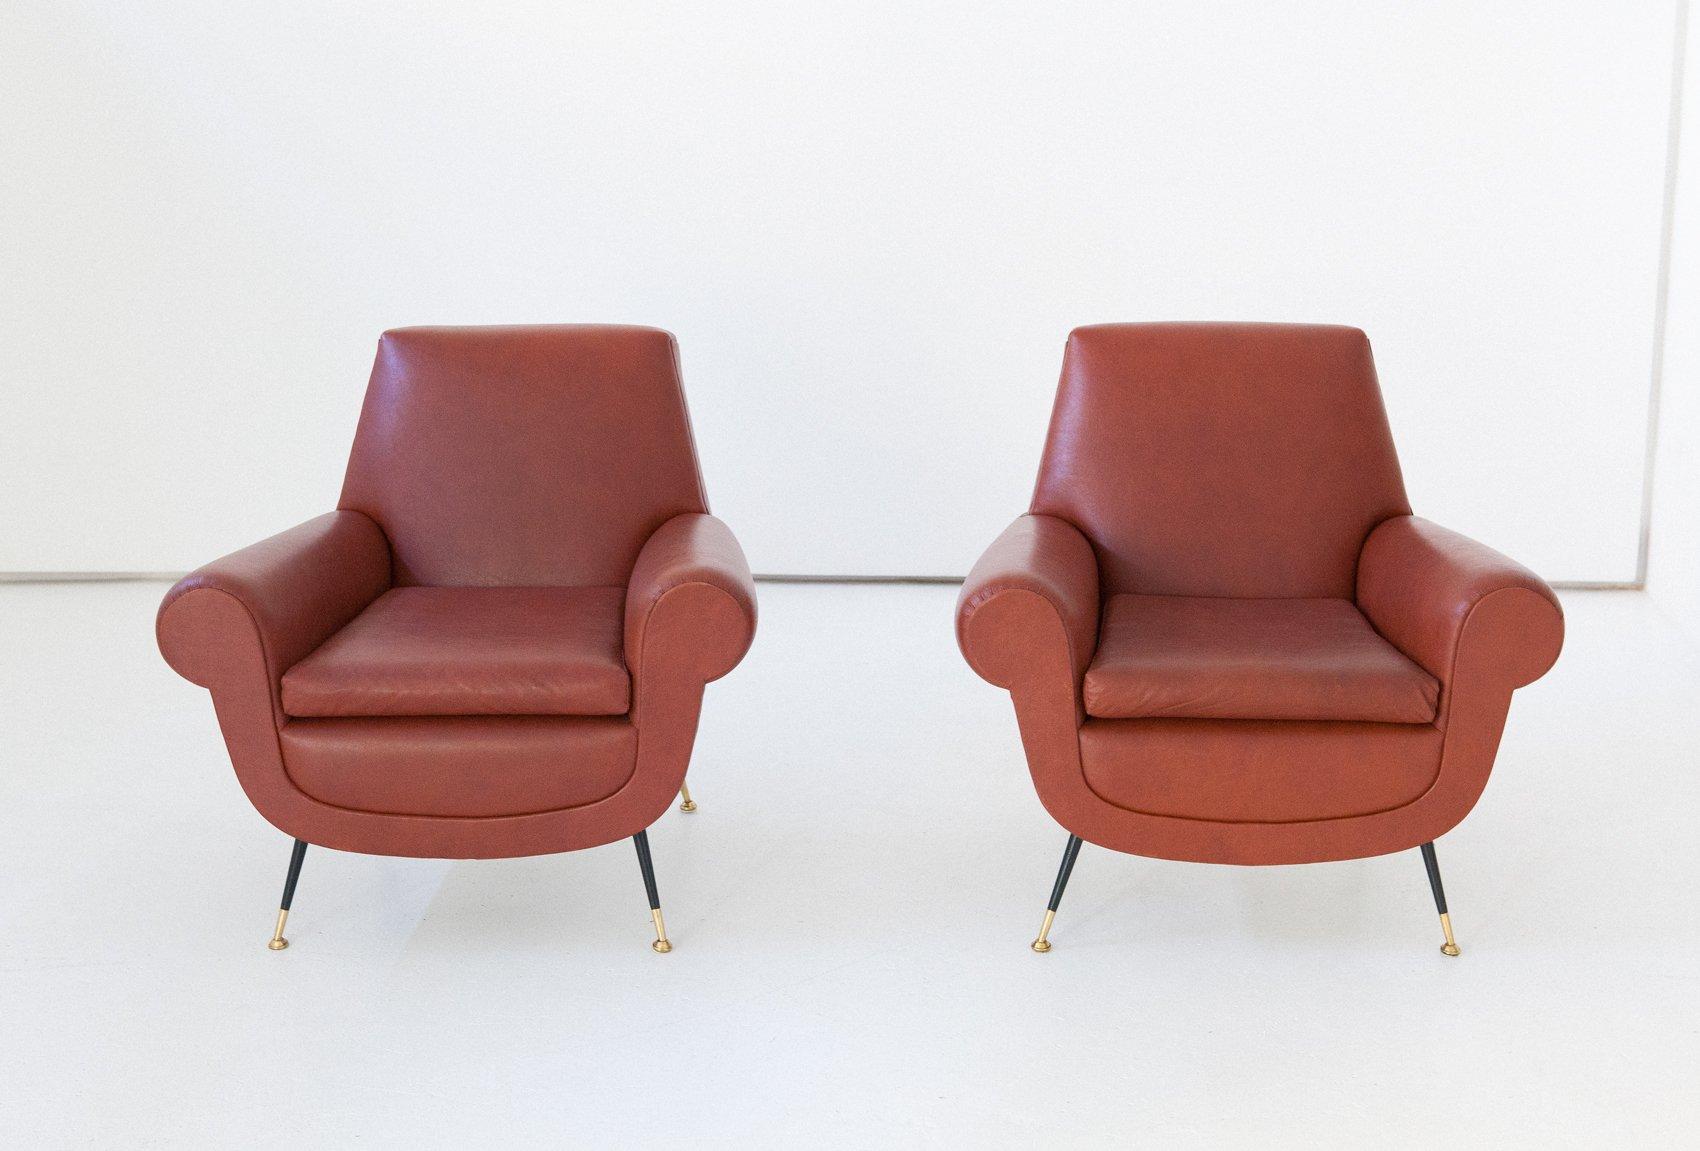 italienische sessel aus kunstleder von gigi radice f r. Black Bedroom Furniture Sets. Home Design Ideas